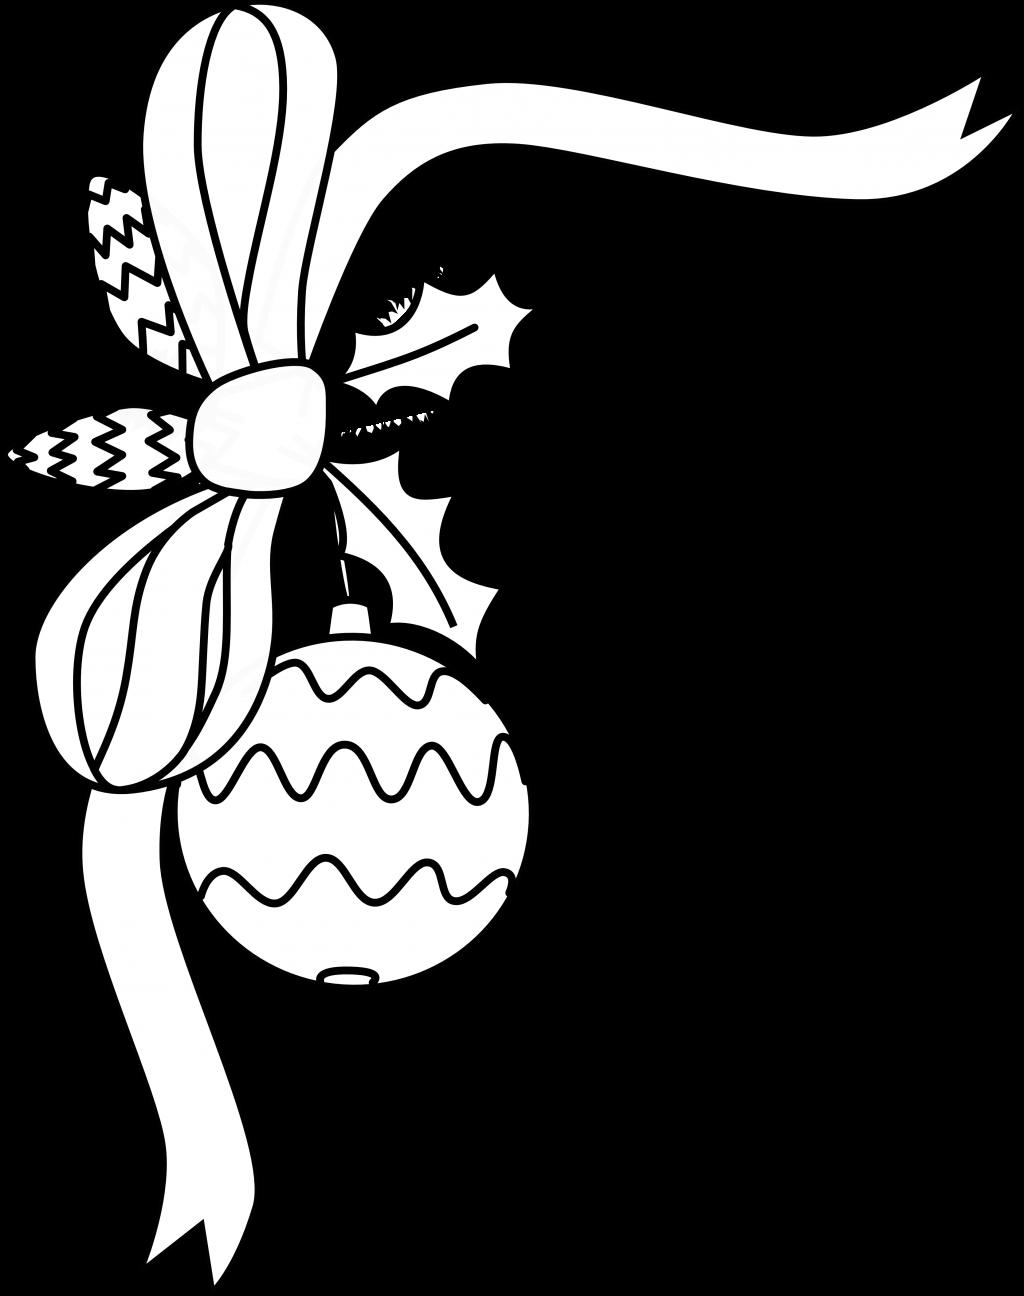 1024x1296 Christmas ~ Christmas Border Clipart Black And White Whit